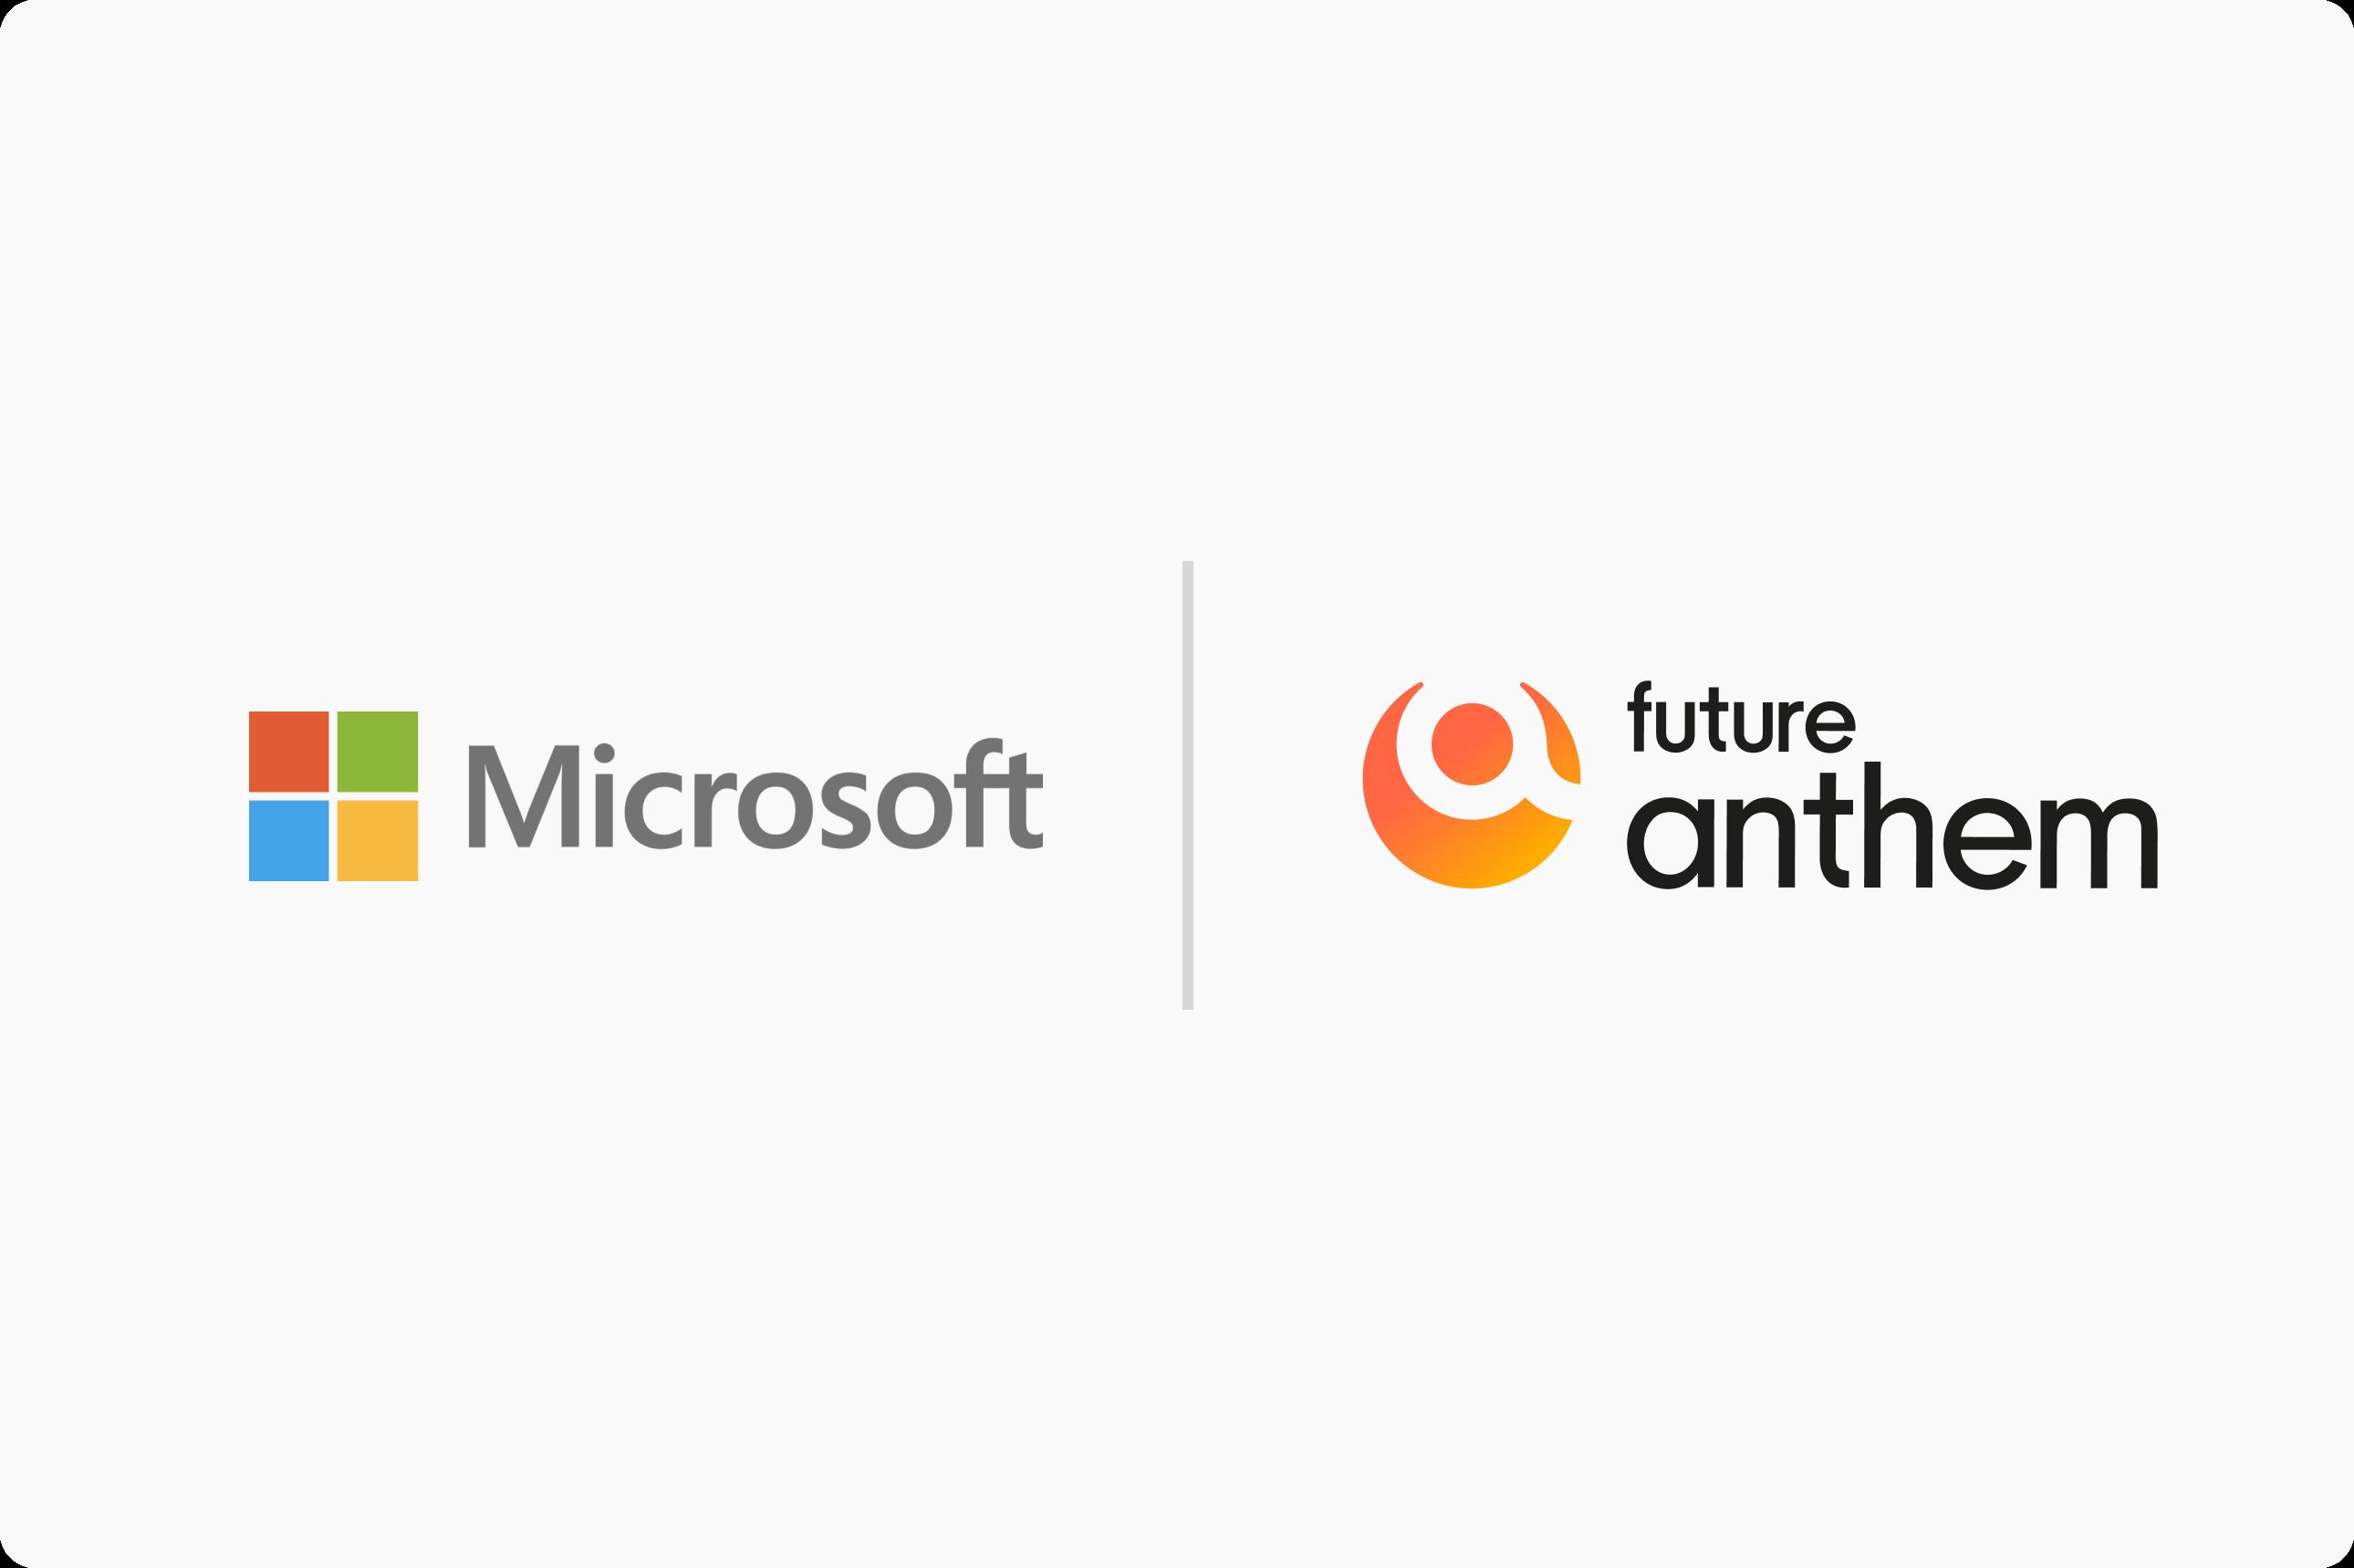 Microsoft - Future Anthem